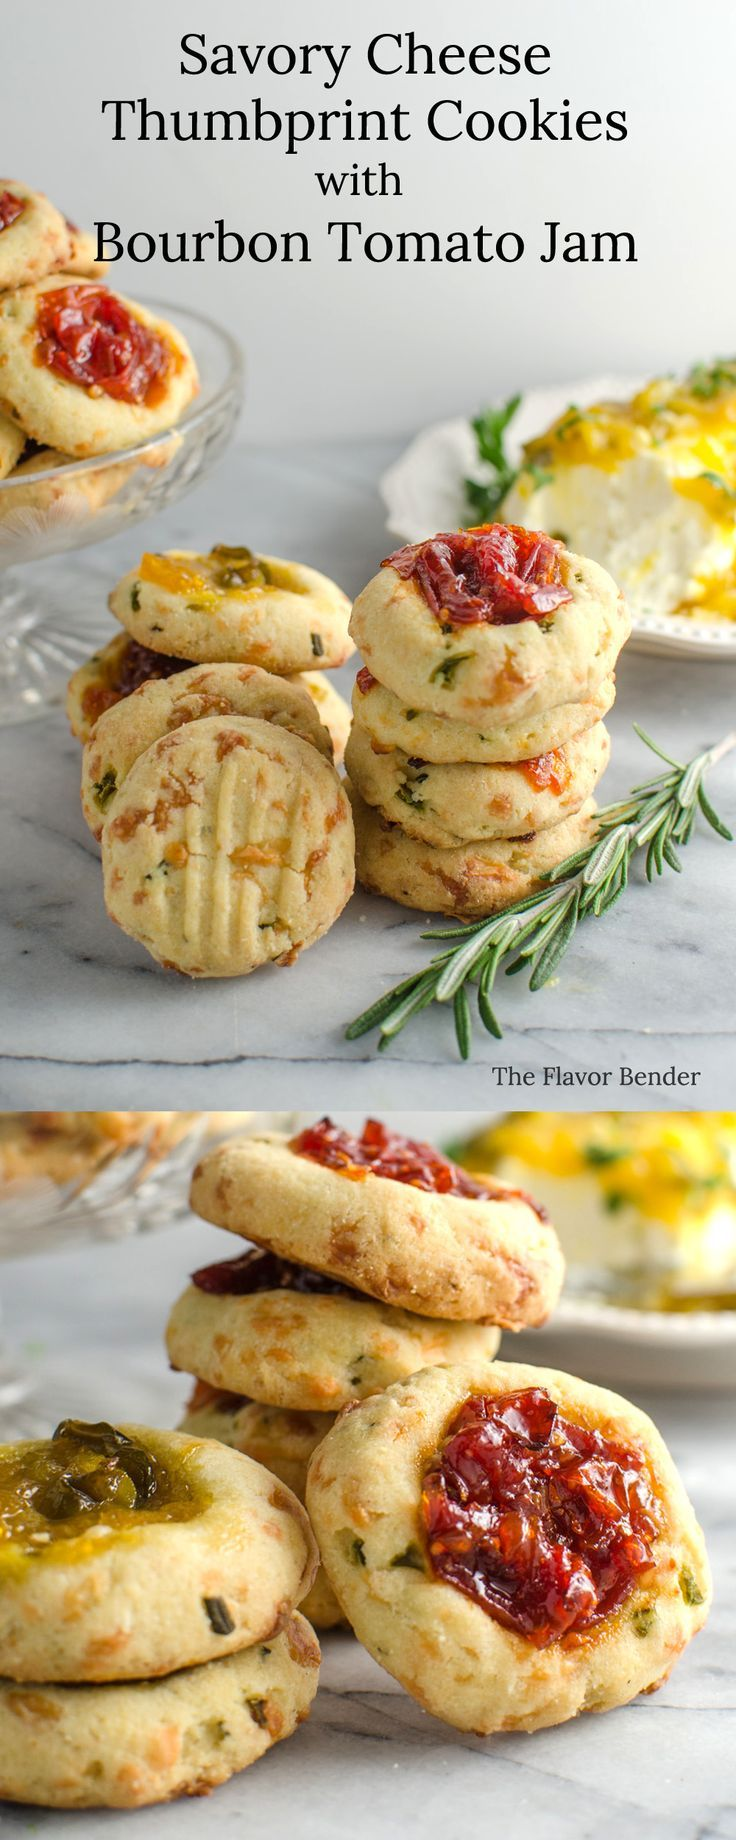 Cheesy Thumbprint Cookies with Bourbon Tomato Jam { Savory Cookies }